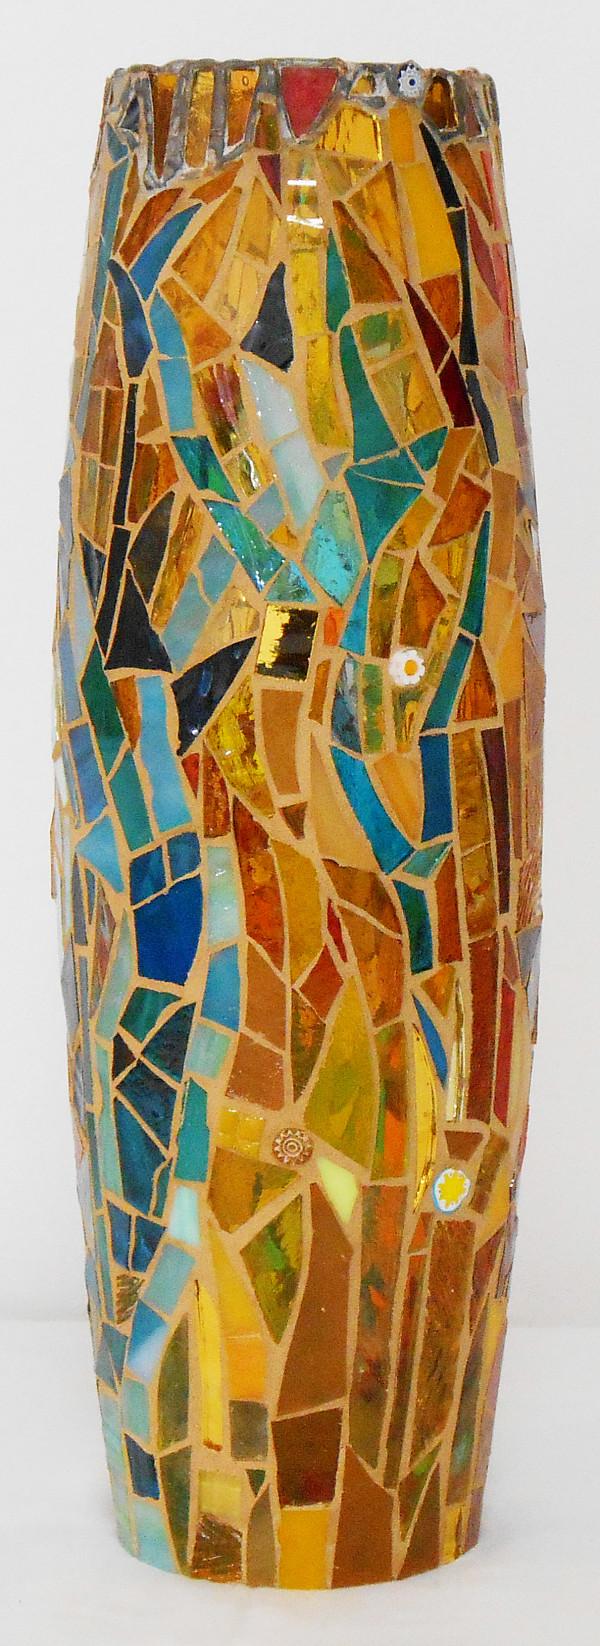 Transformation (vase) by Andrea L Edmundson